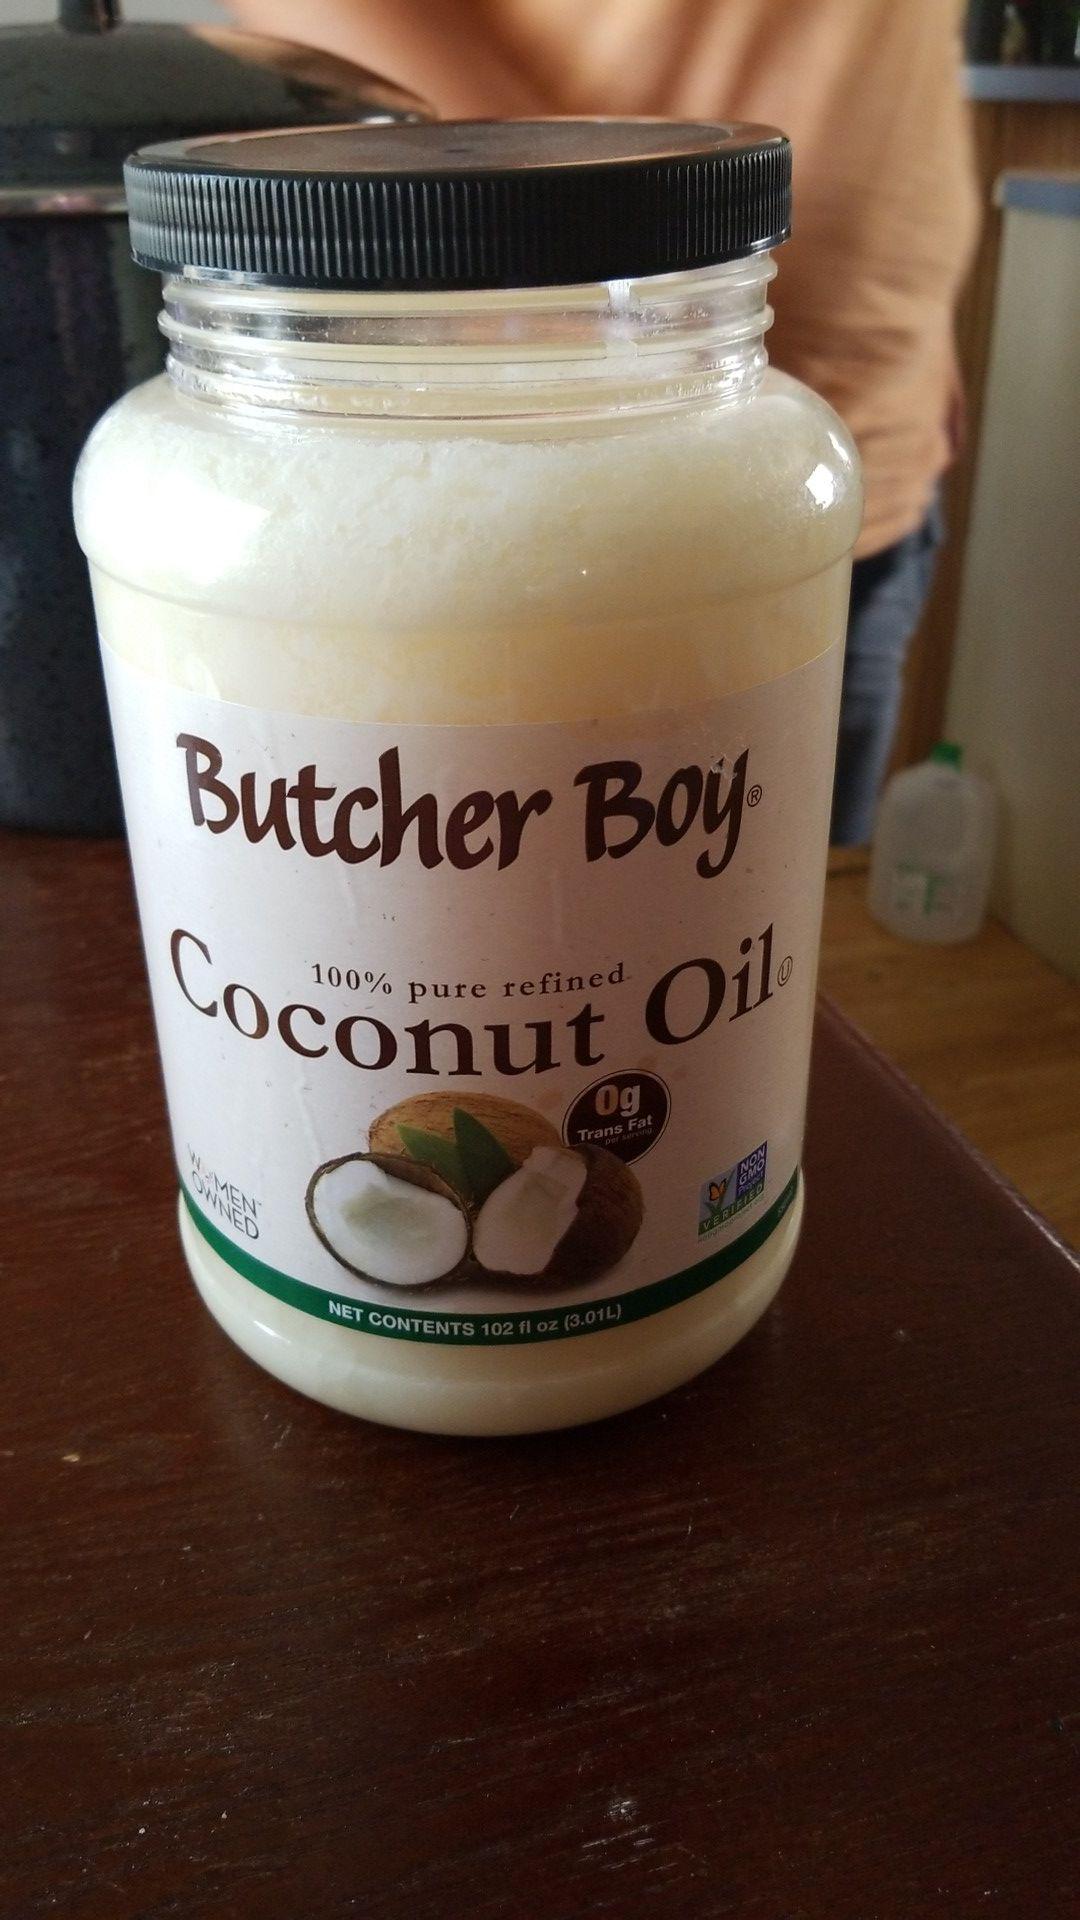 Butcher boy 100% coconut oil